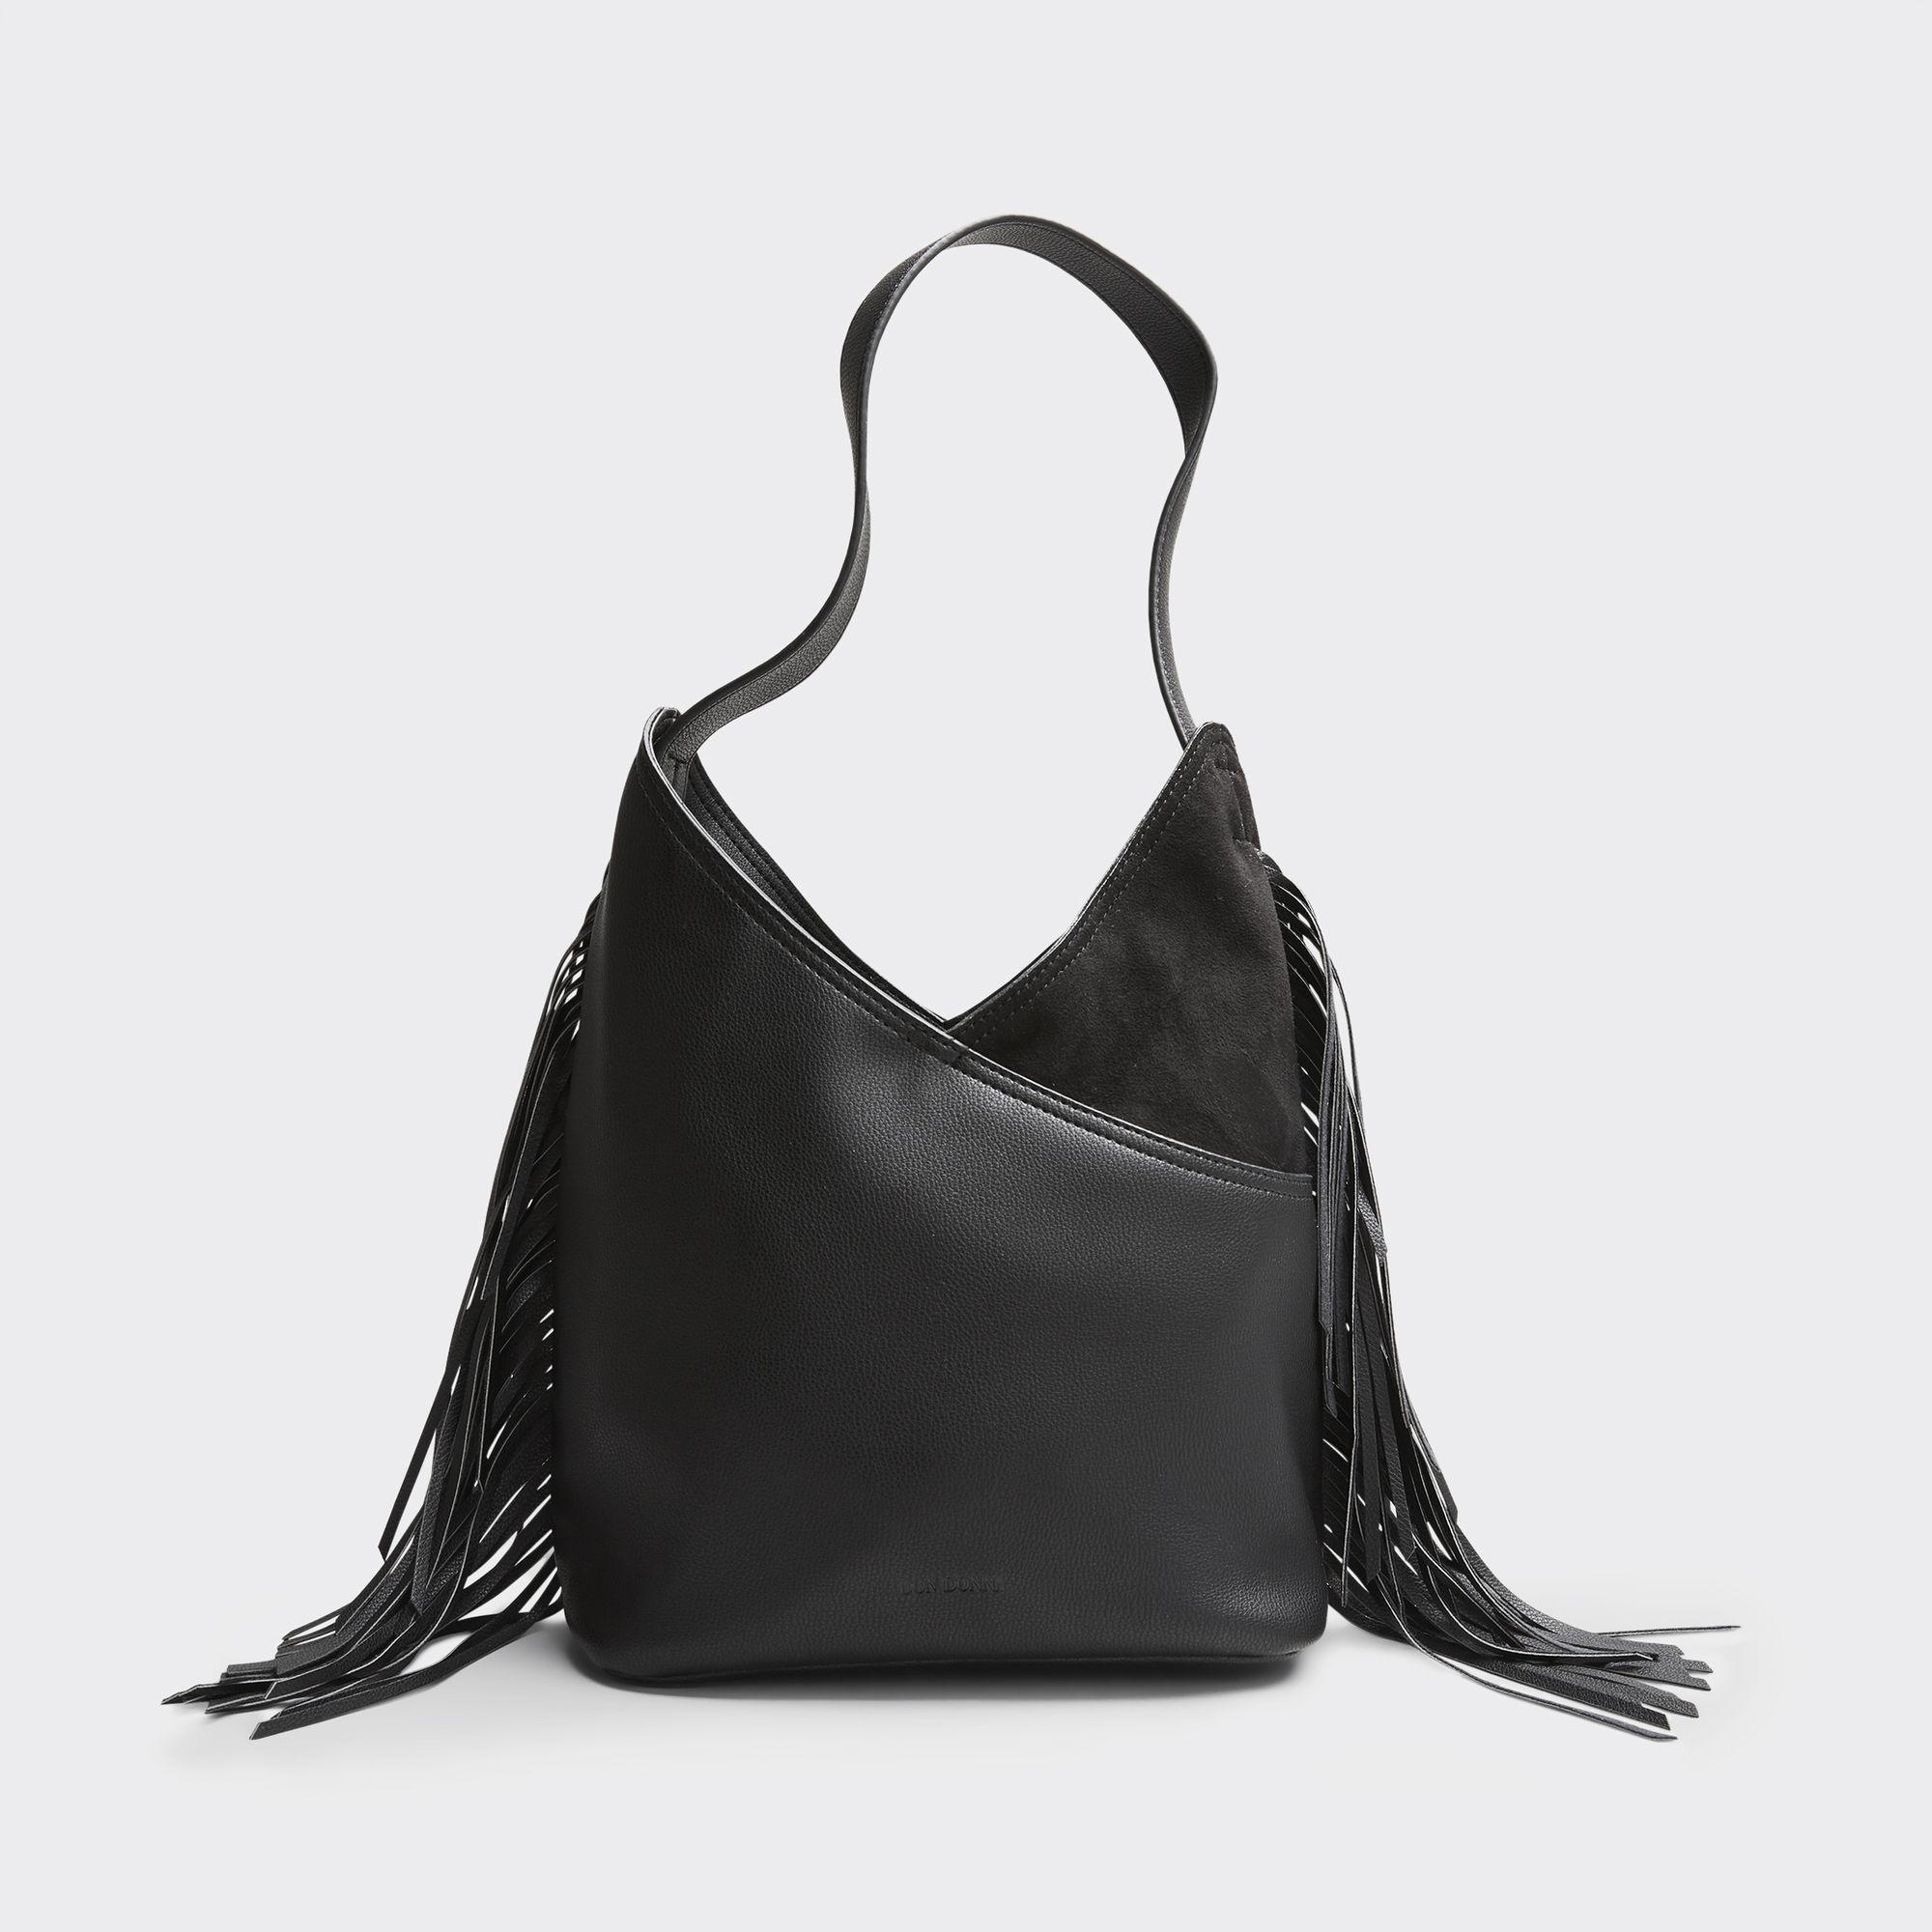 Don Donna Jewel Small Hobo handväska, Svart